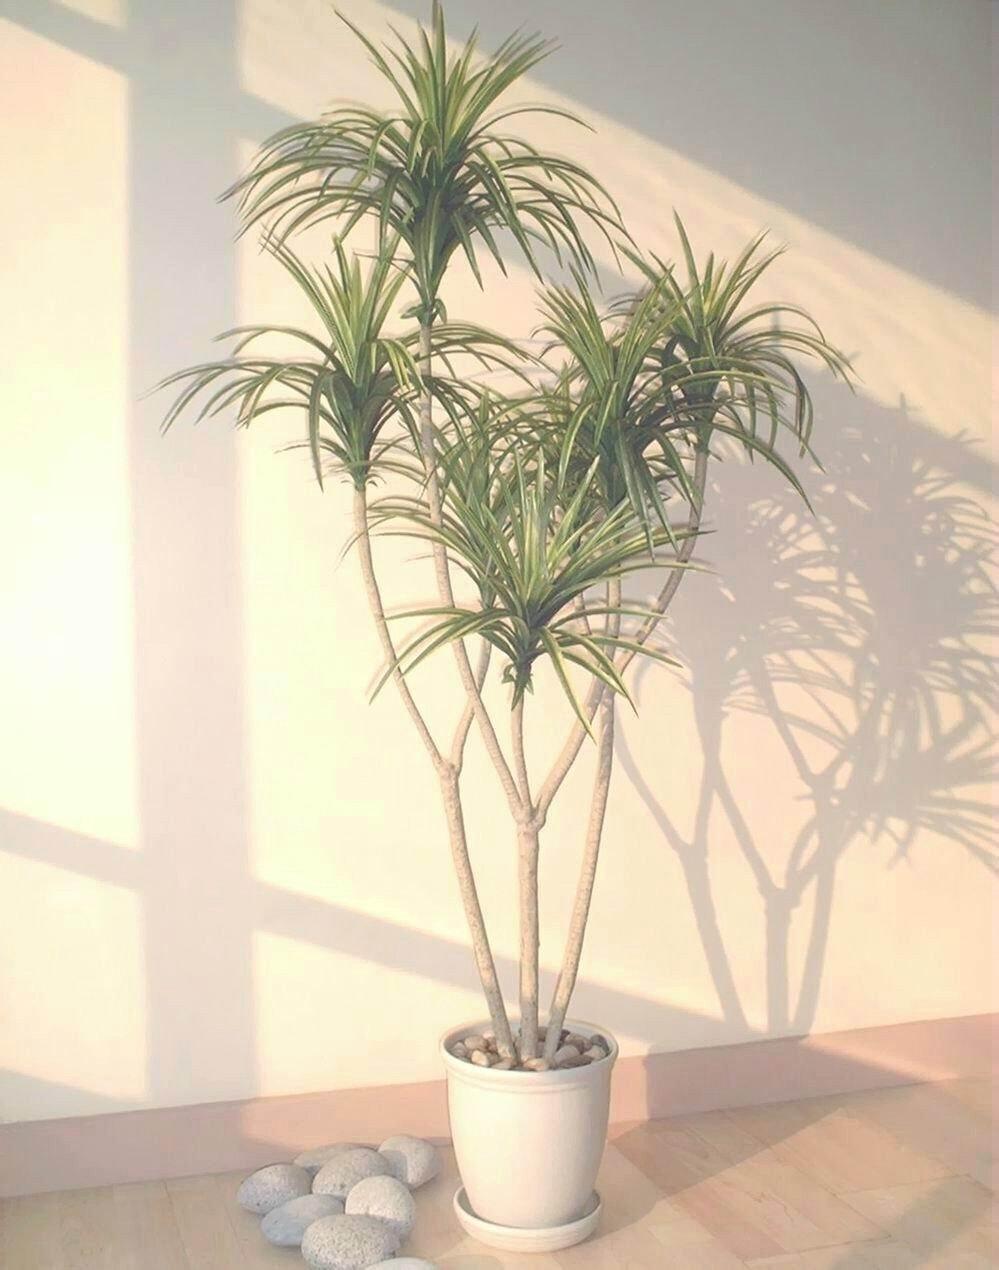 amazoncom 45ft yucca palm artificial tree without pot home u0026 kitchen